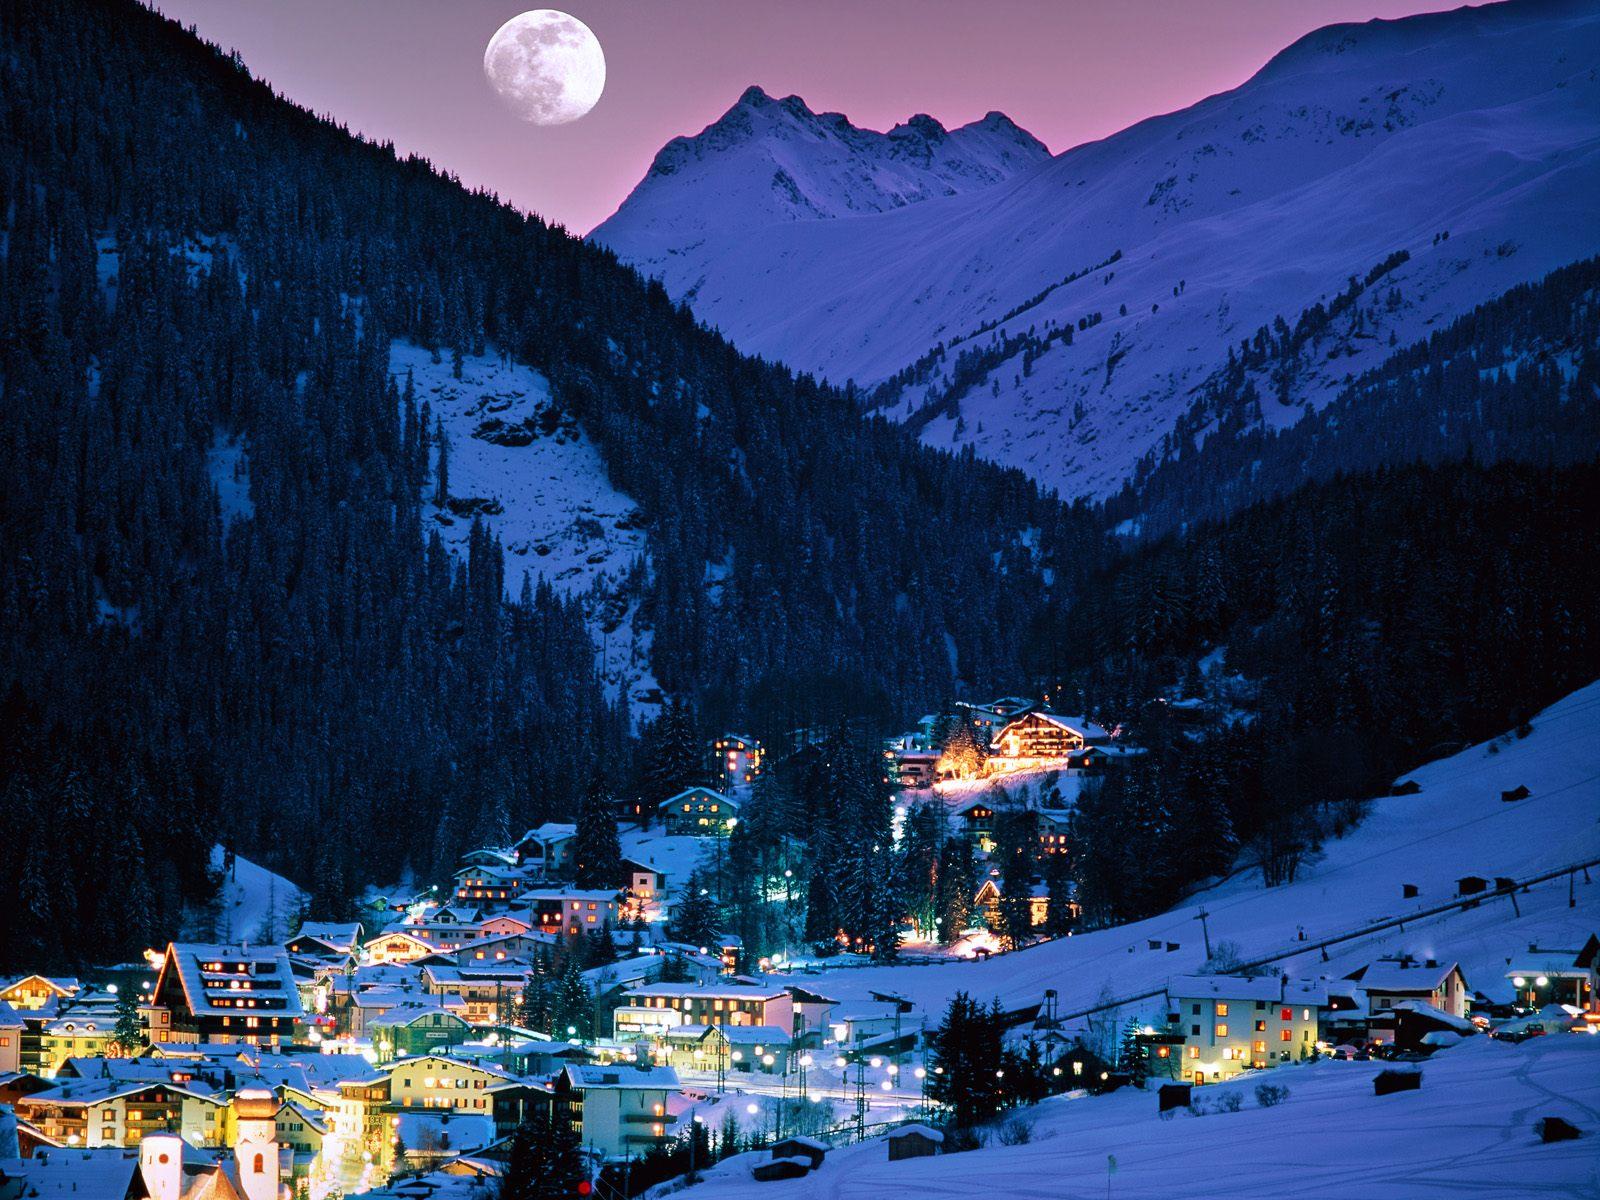 http://2.bp.blogspot.com/-9LKWVqvBRxU/TonL1mViYjI/AAAAAAAAAZI/sNwWMZ-k9zw/s1600/St.+Anton+at+Arlberg%252C+Tirol%252C+Austria.jpg